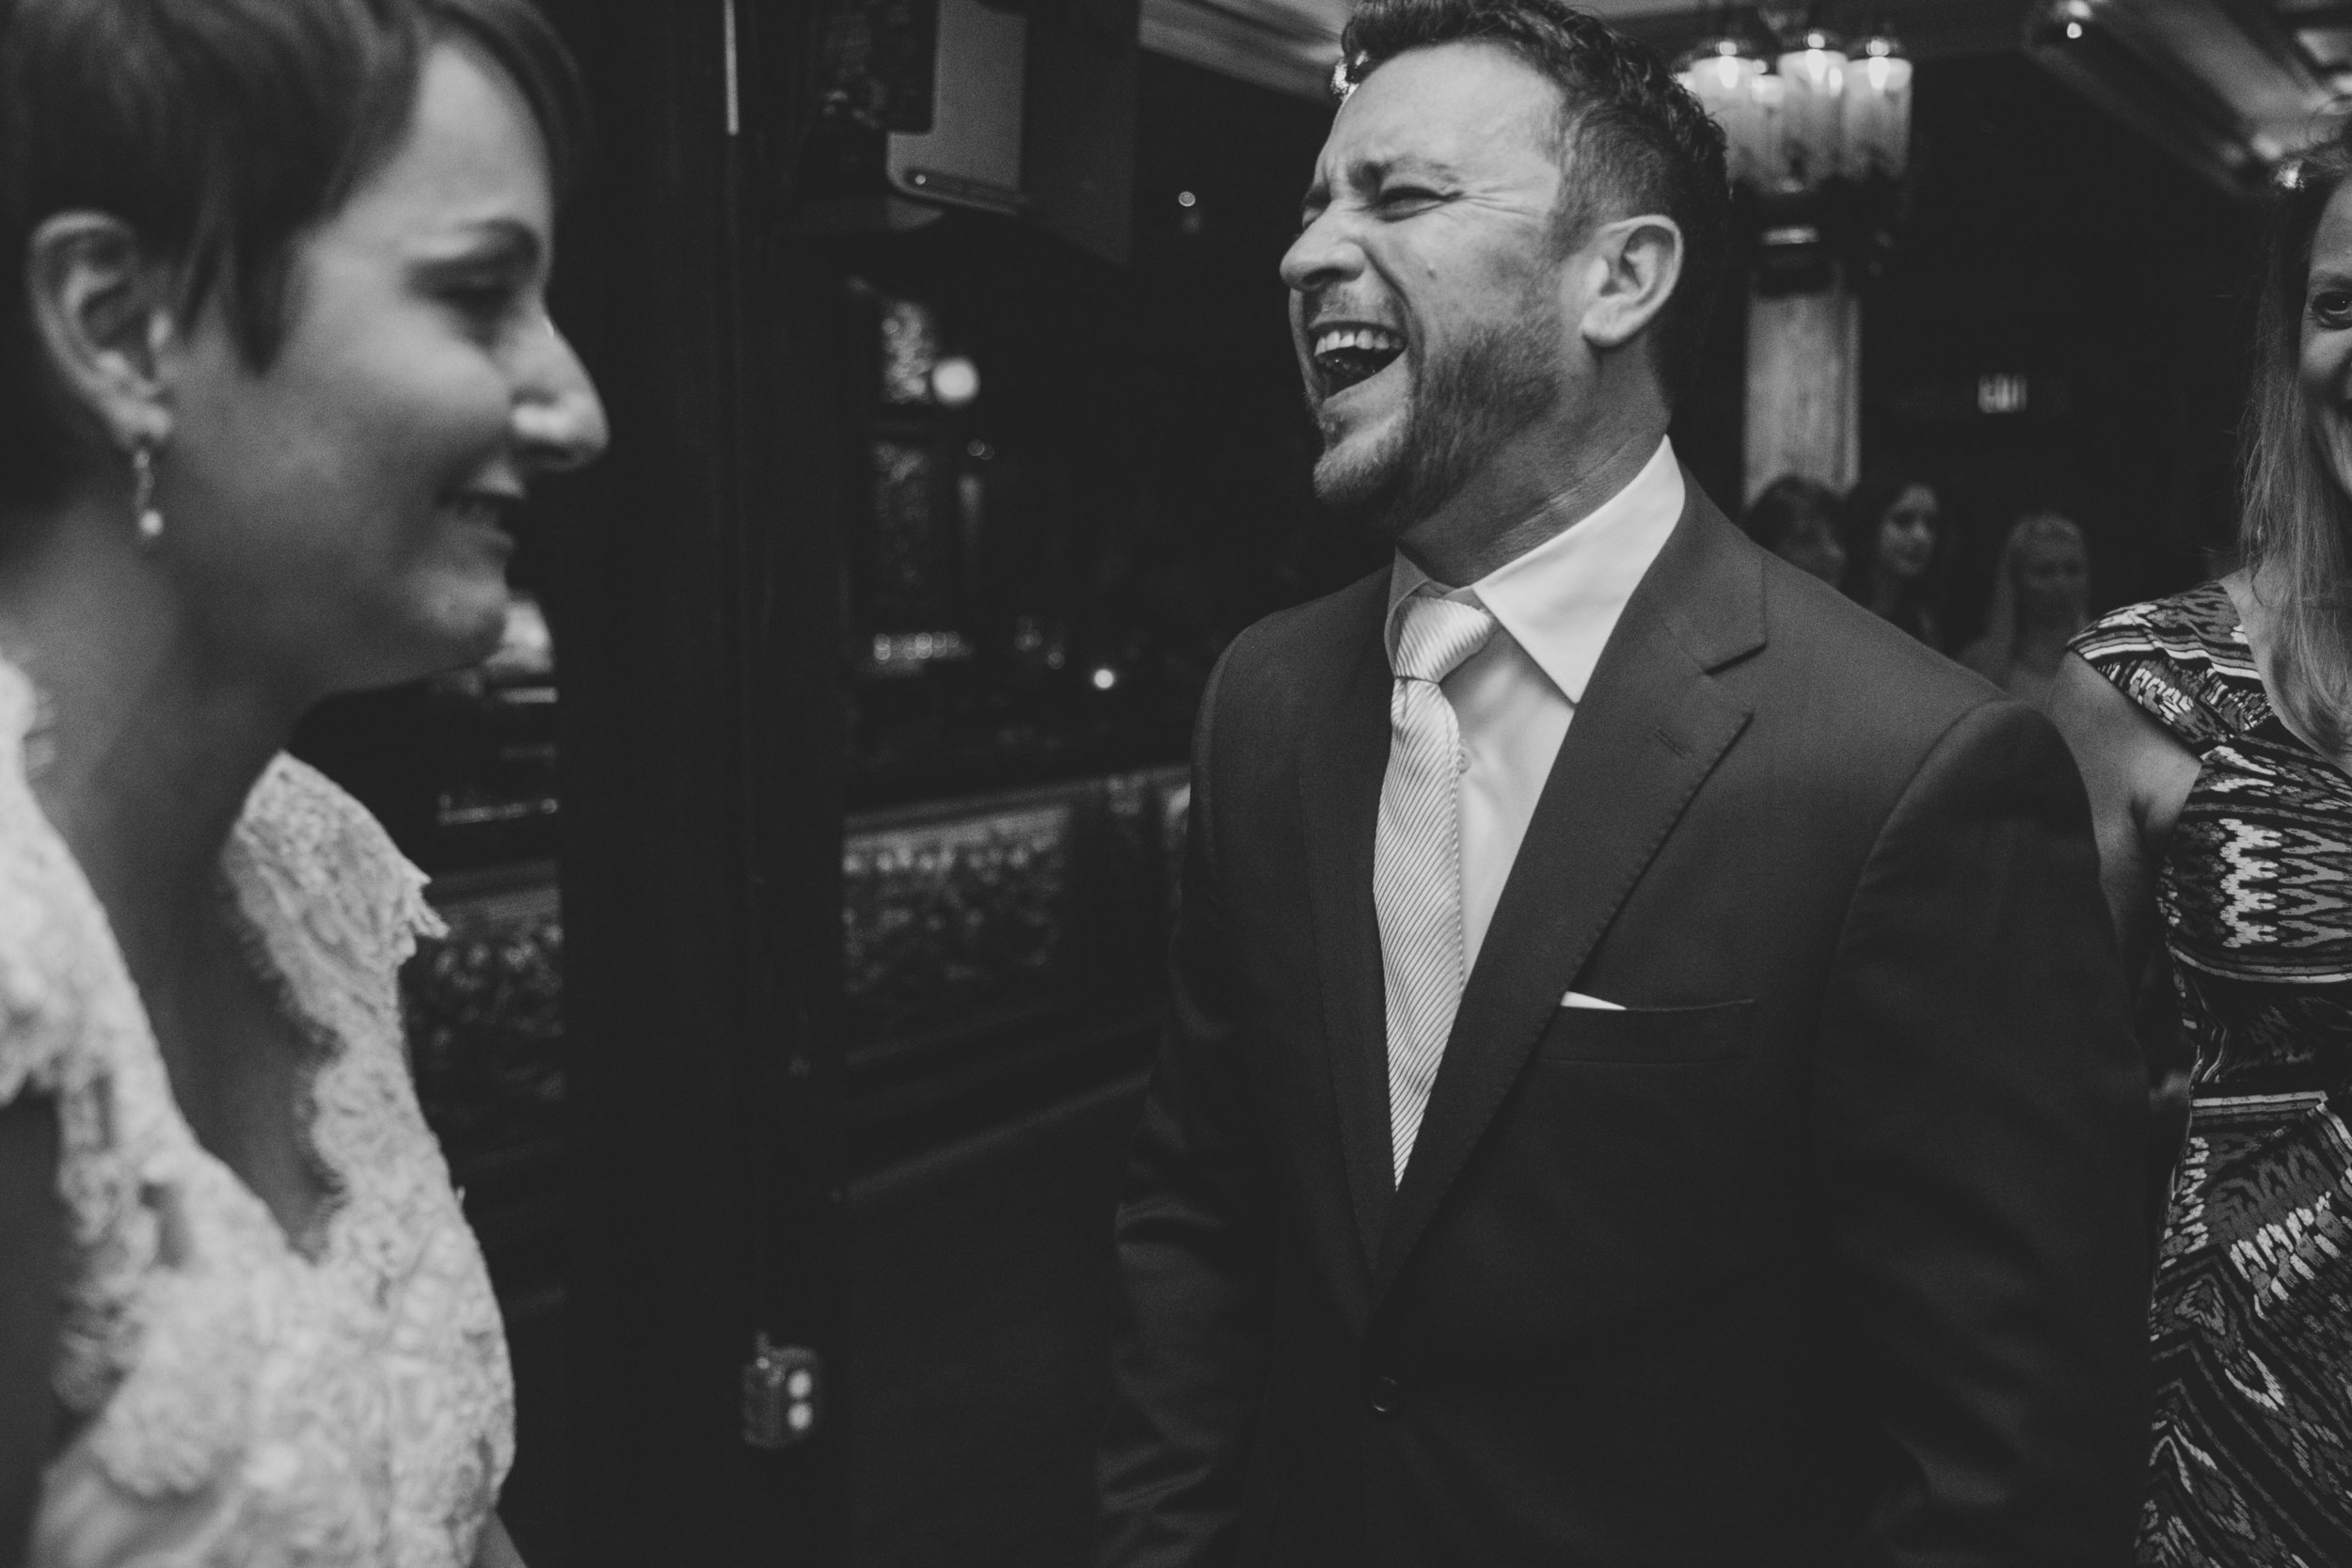 ATGI_Kat and Gabe Wedding 2016_2S8A5695.jpg